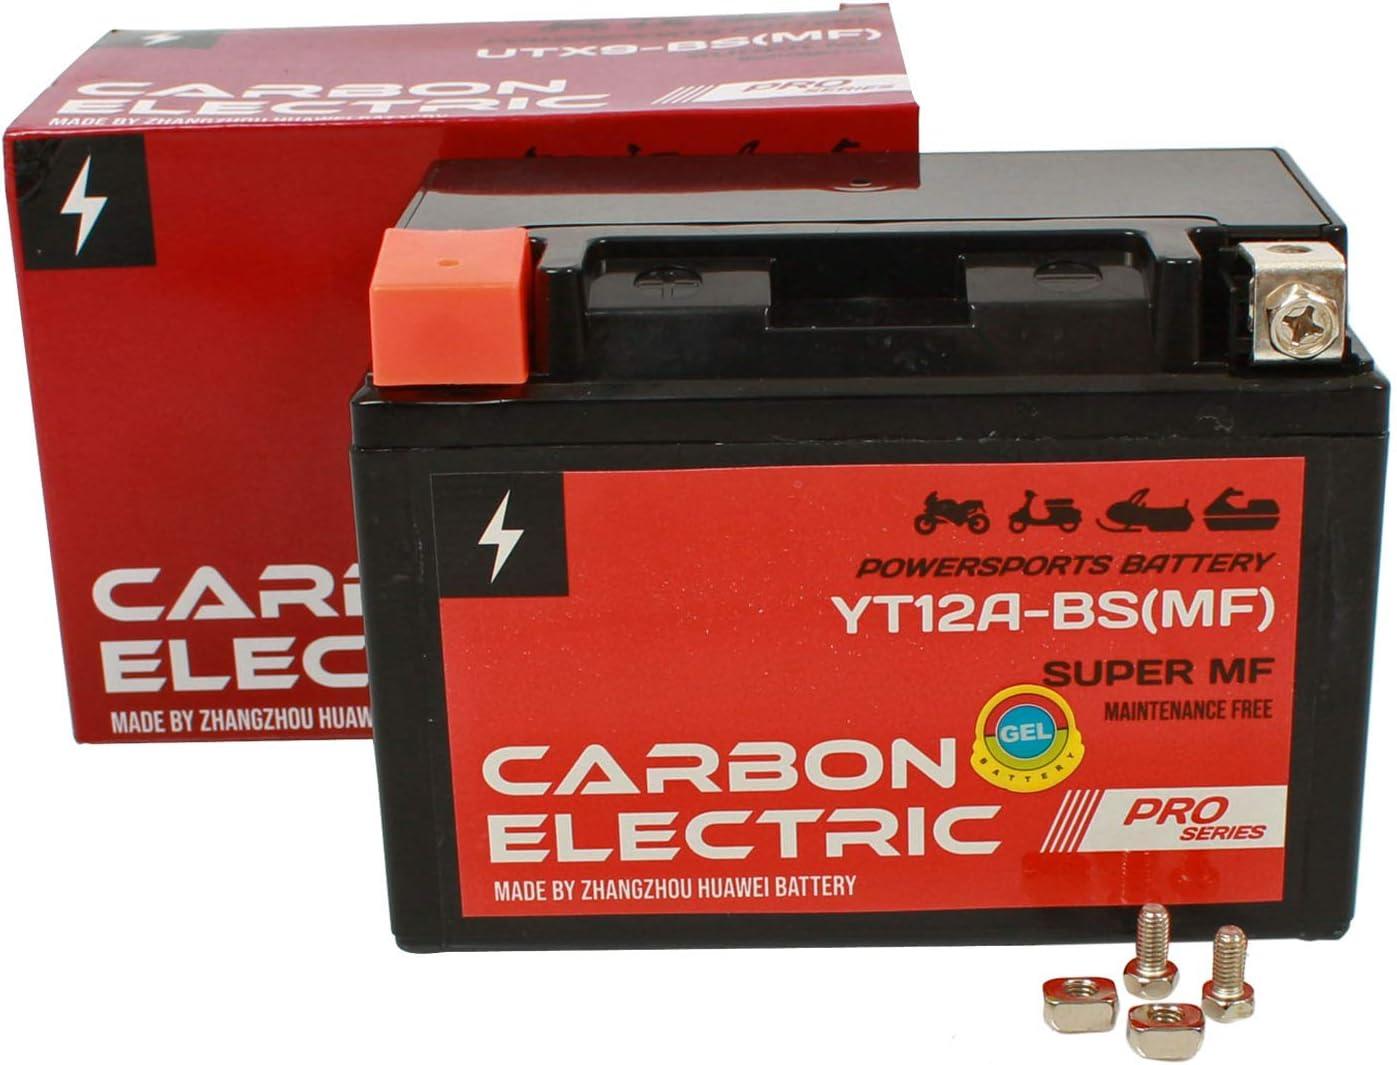 Carbon Electric YT12A-BS MF Gel Batterie 12 V 9.5 Ah Wartungsfrei Versiegelt Motorrad Roller Motorradbatterie Rollerbatterie